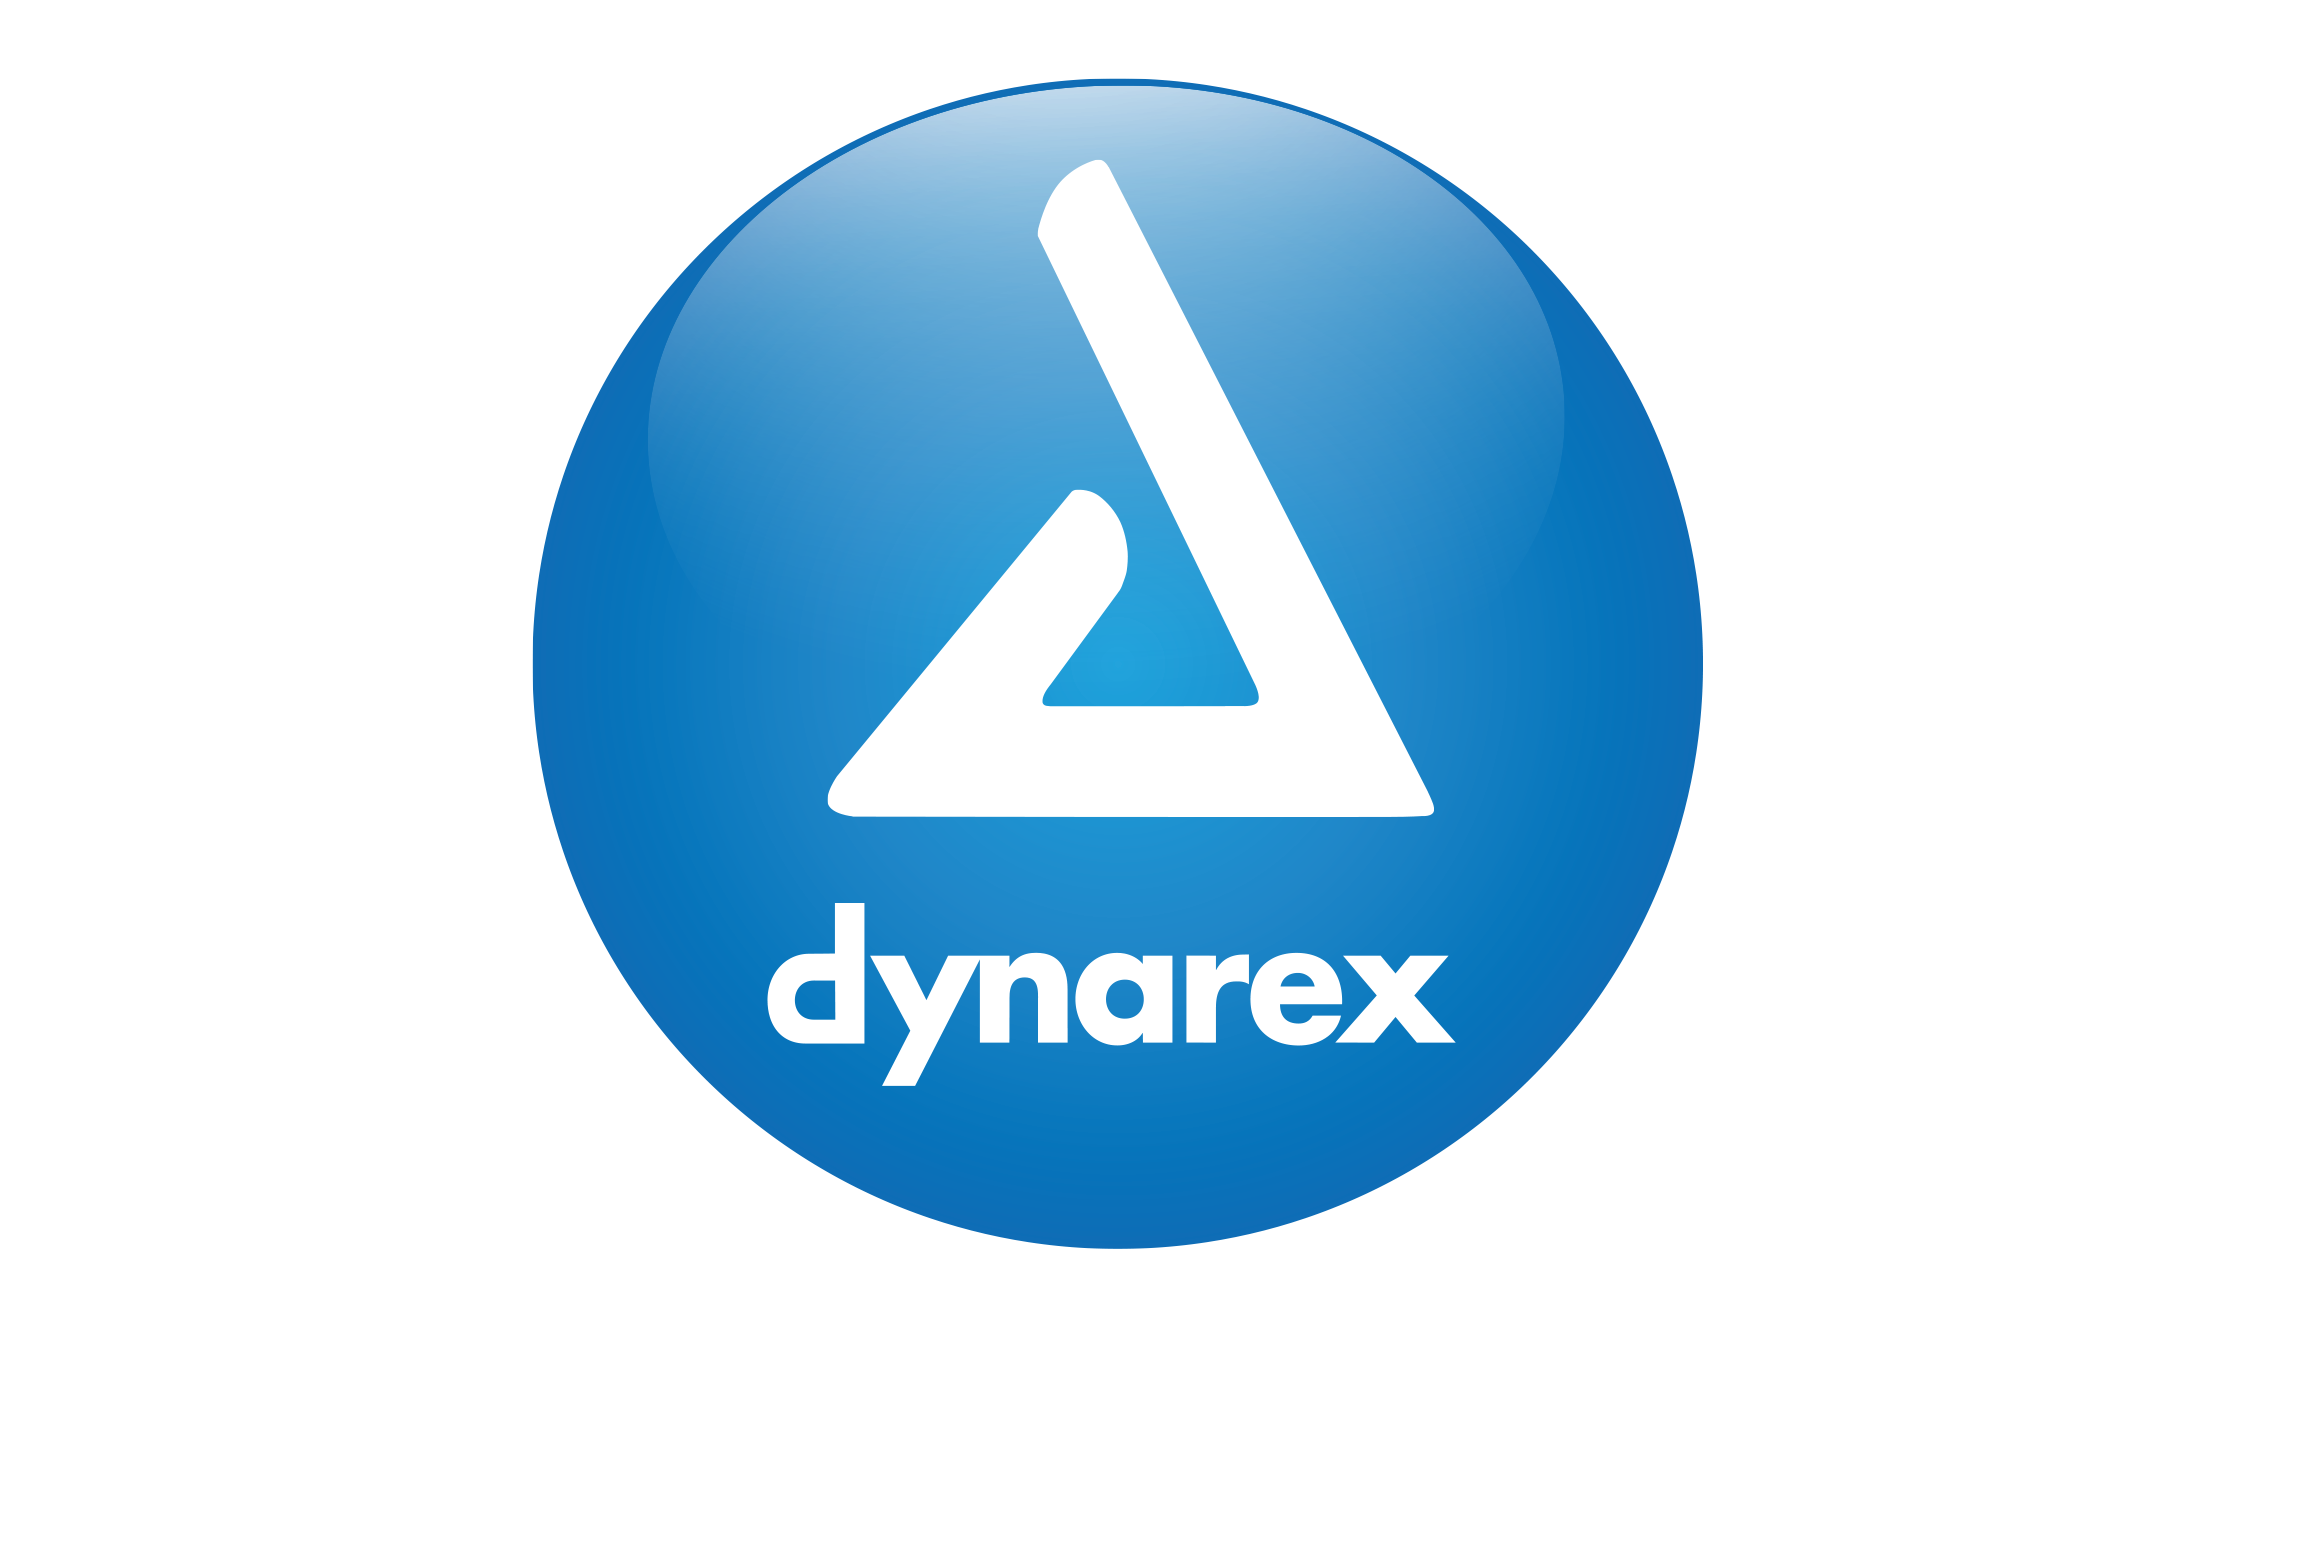 dynarx logi